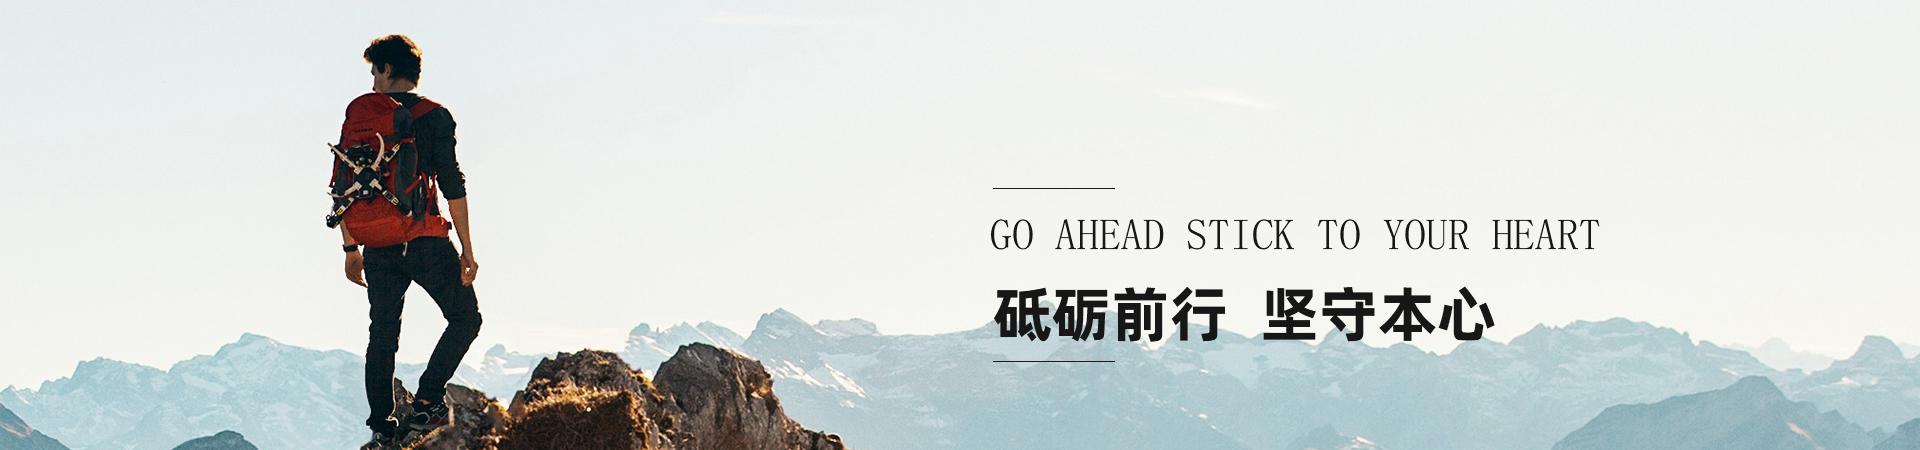 http://www.tianyuhb.cn/data/upload/201910/20191028195104_324.jpg